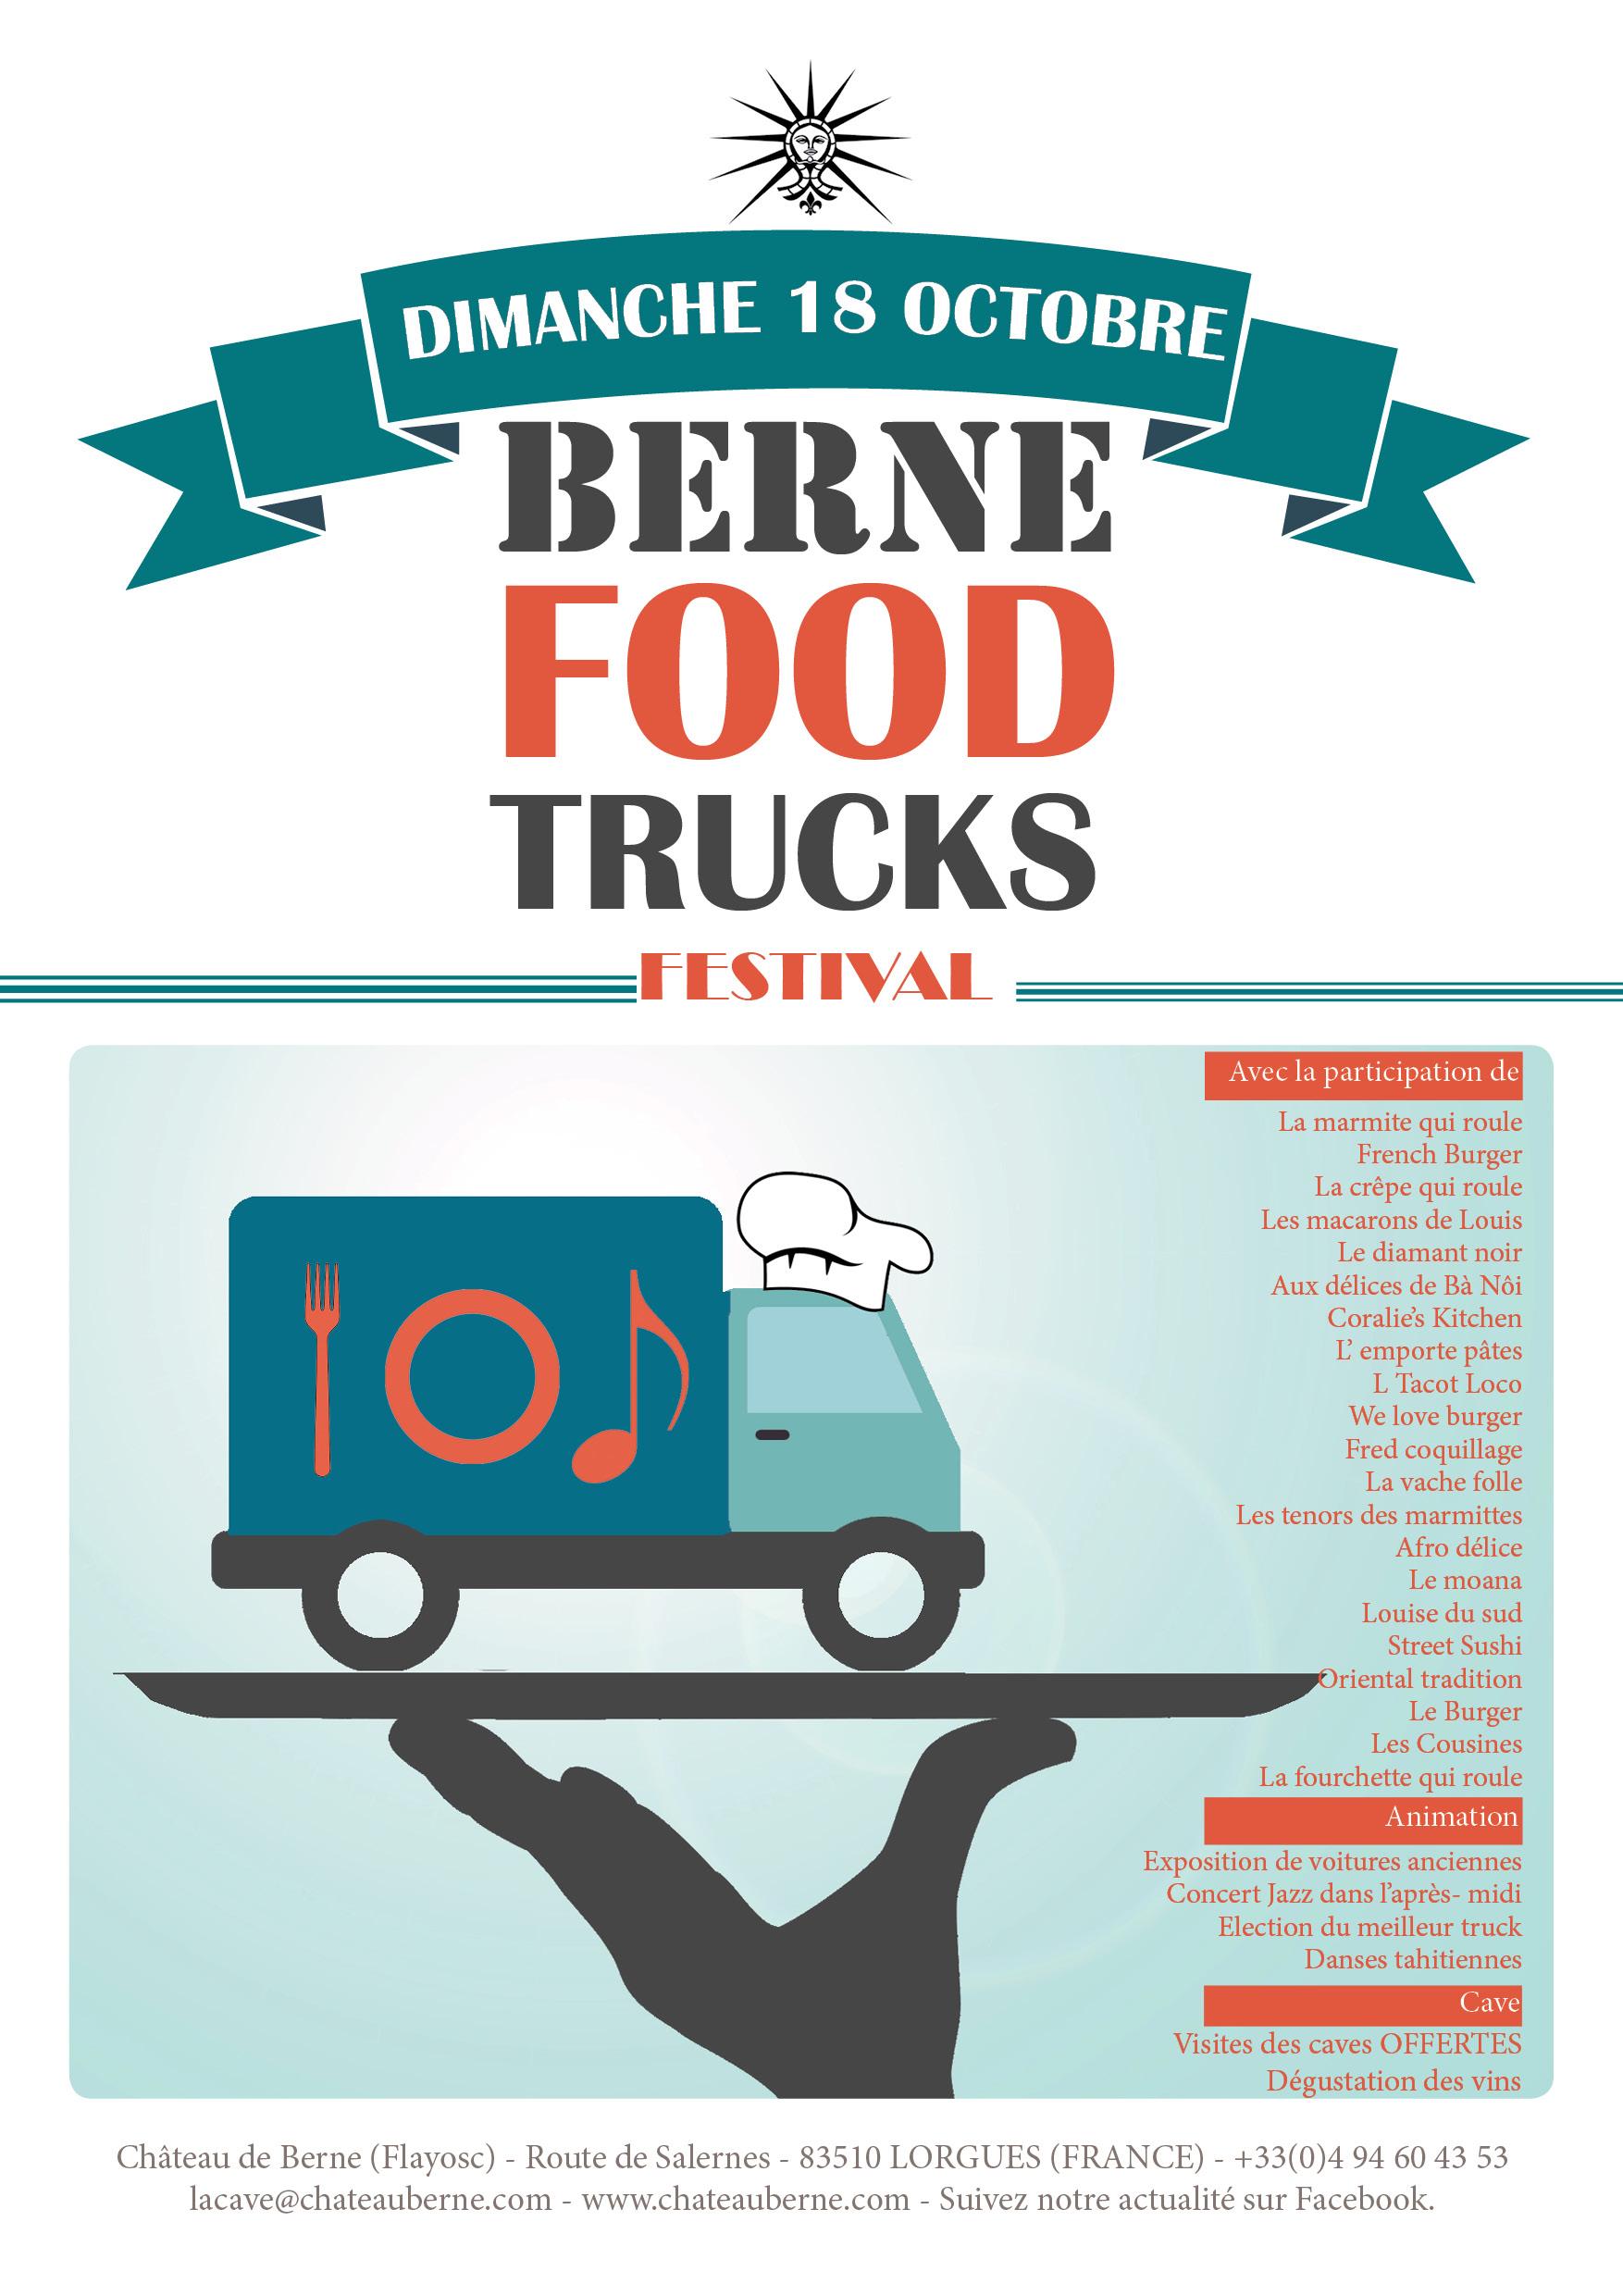 Festival FoodTruck Berne Lorgues  Le Var des gastronomes